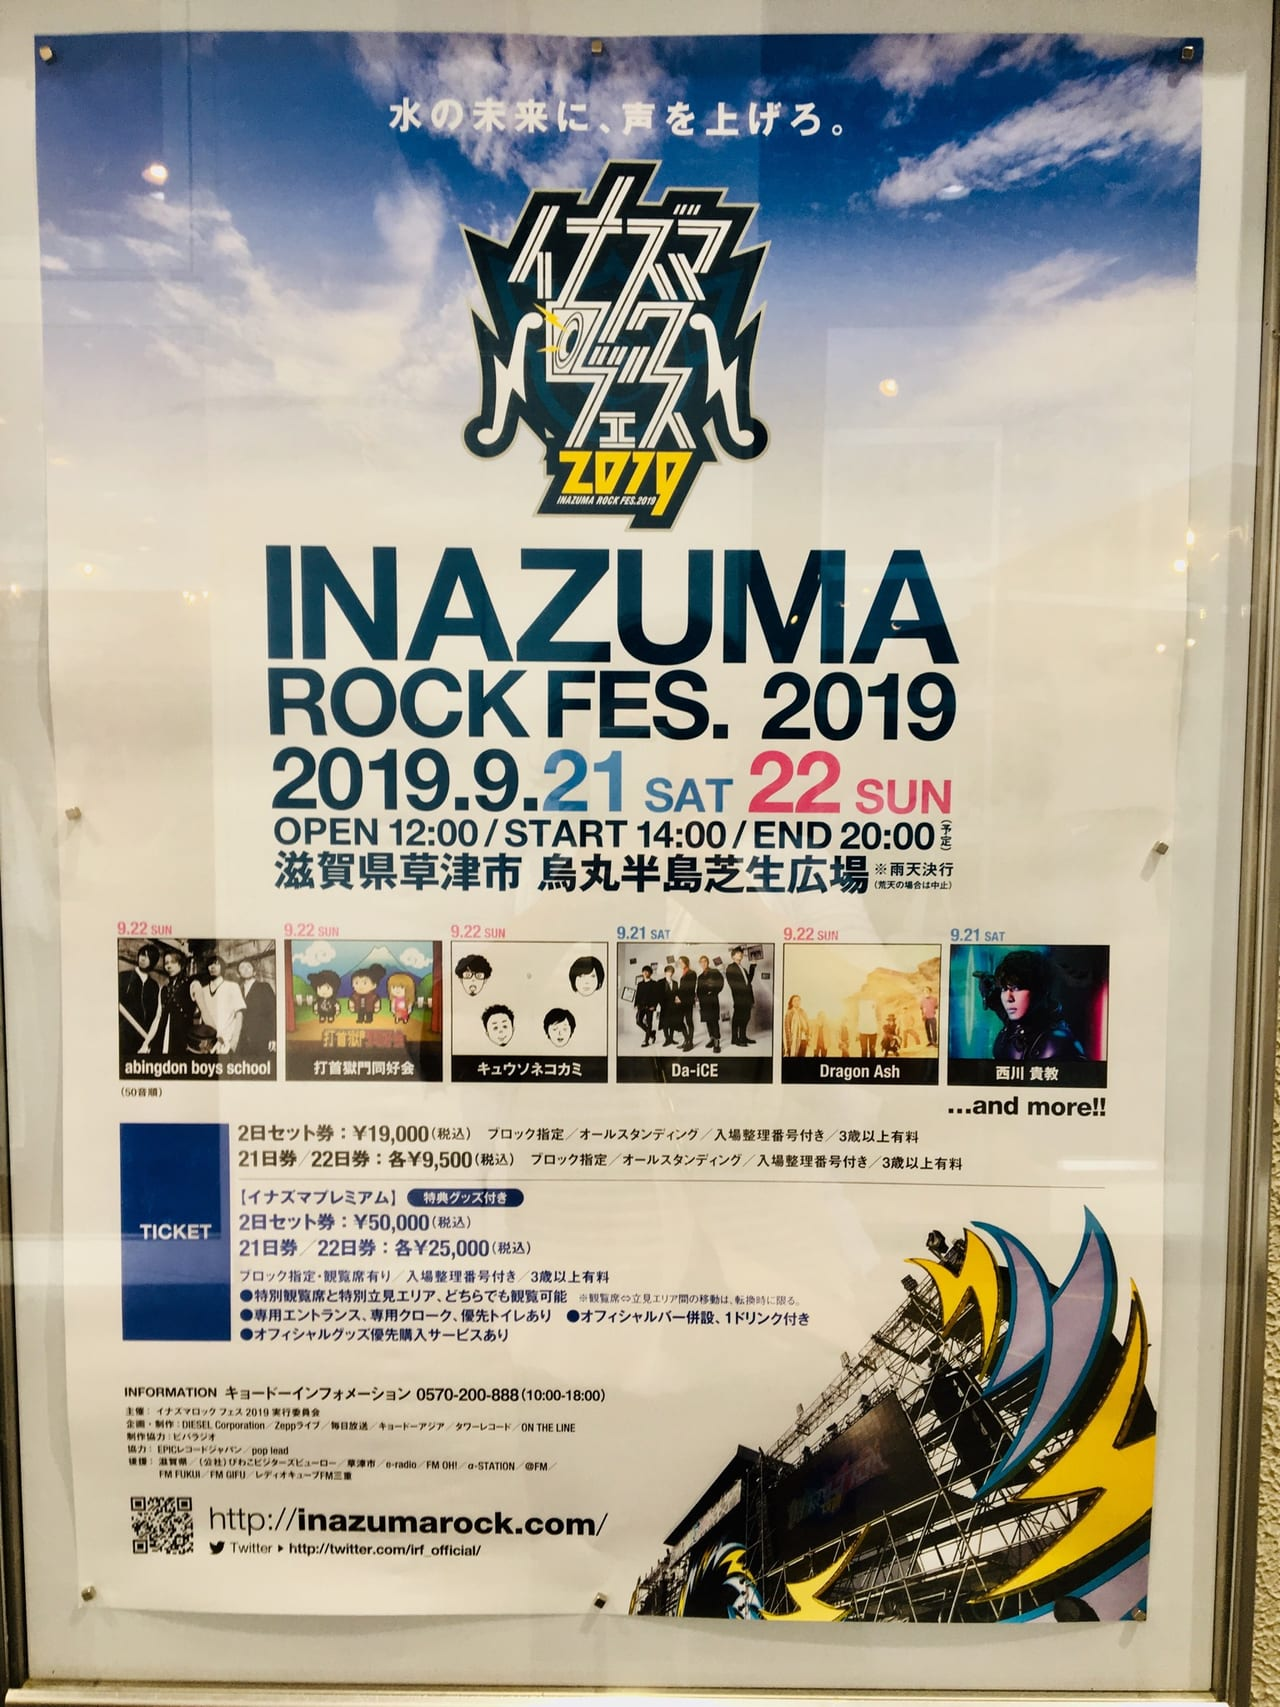 inazuma 2019